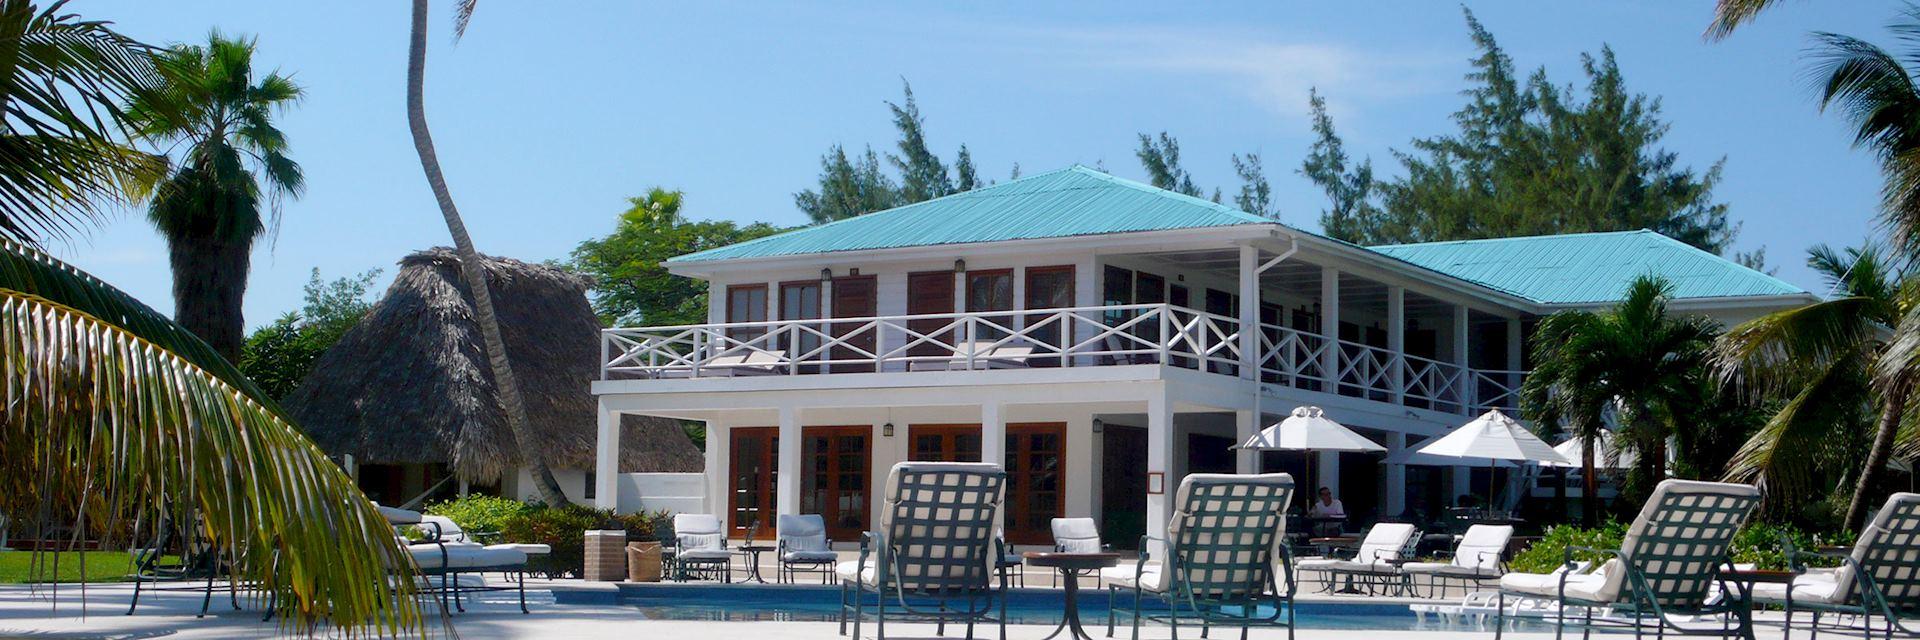 Victoria House, Ambergris Caye